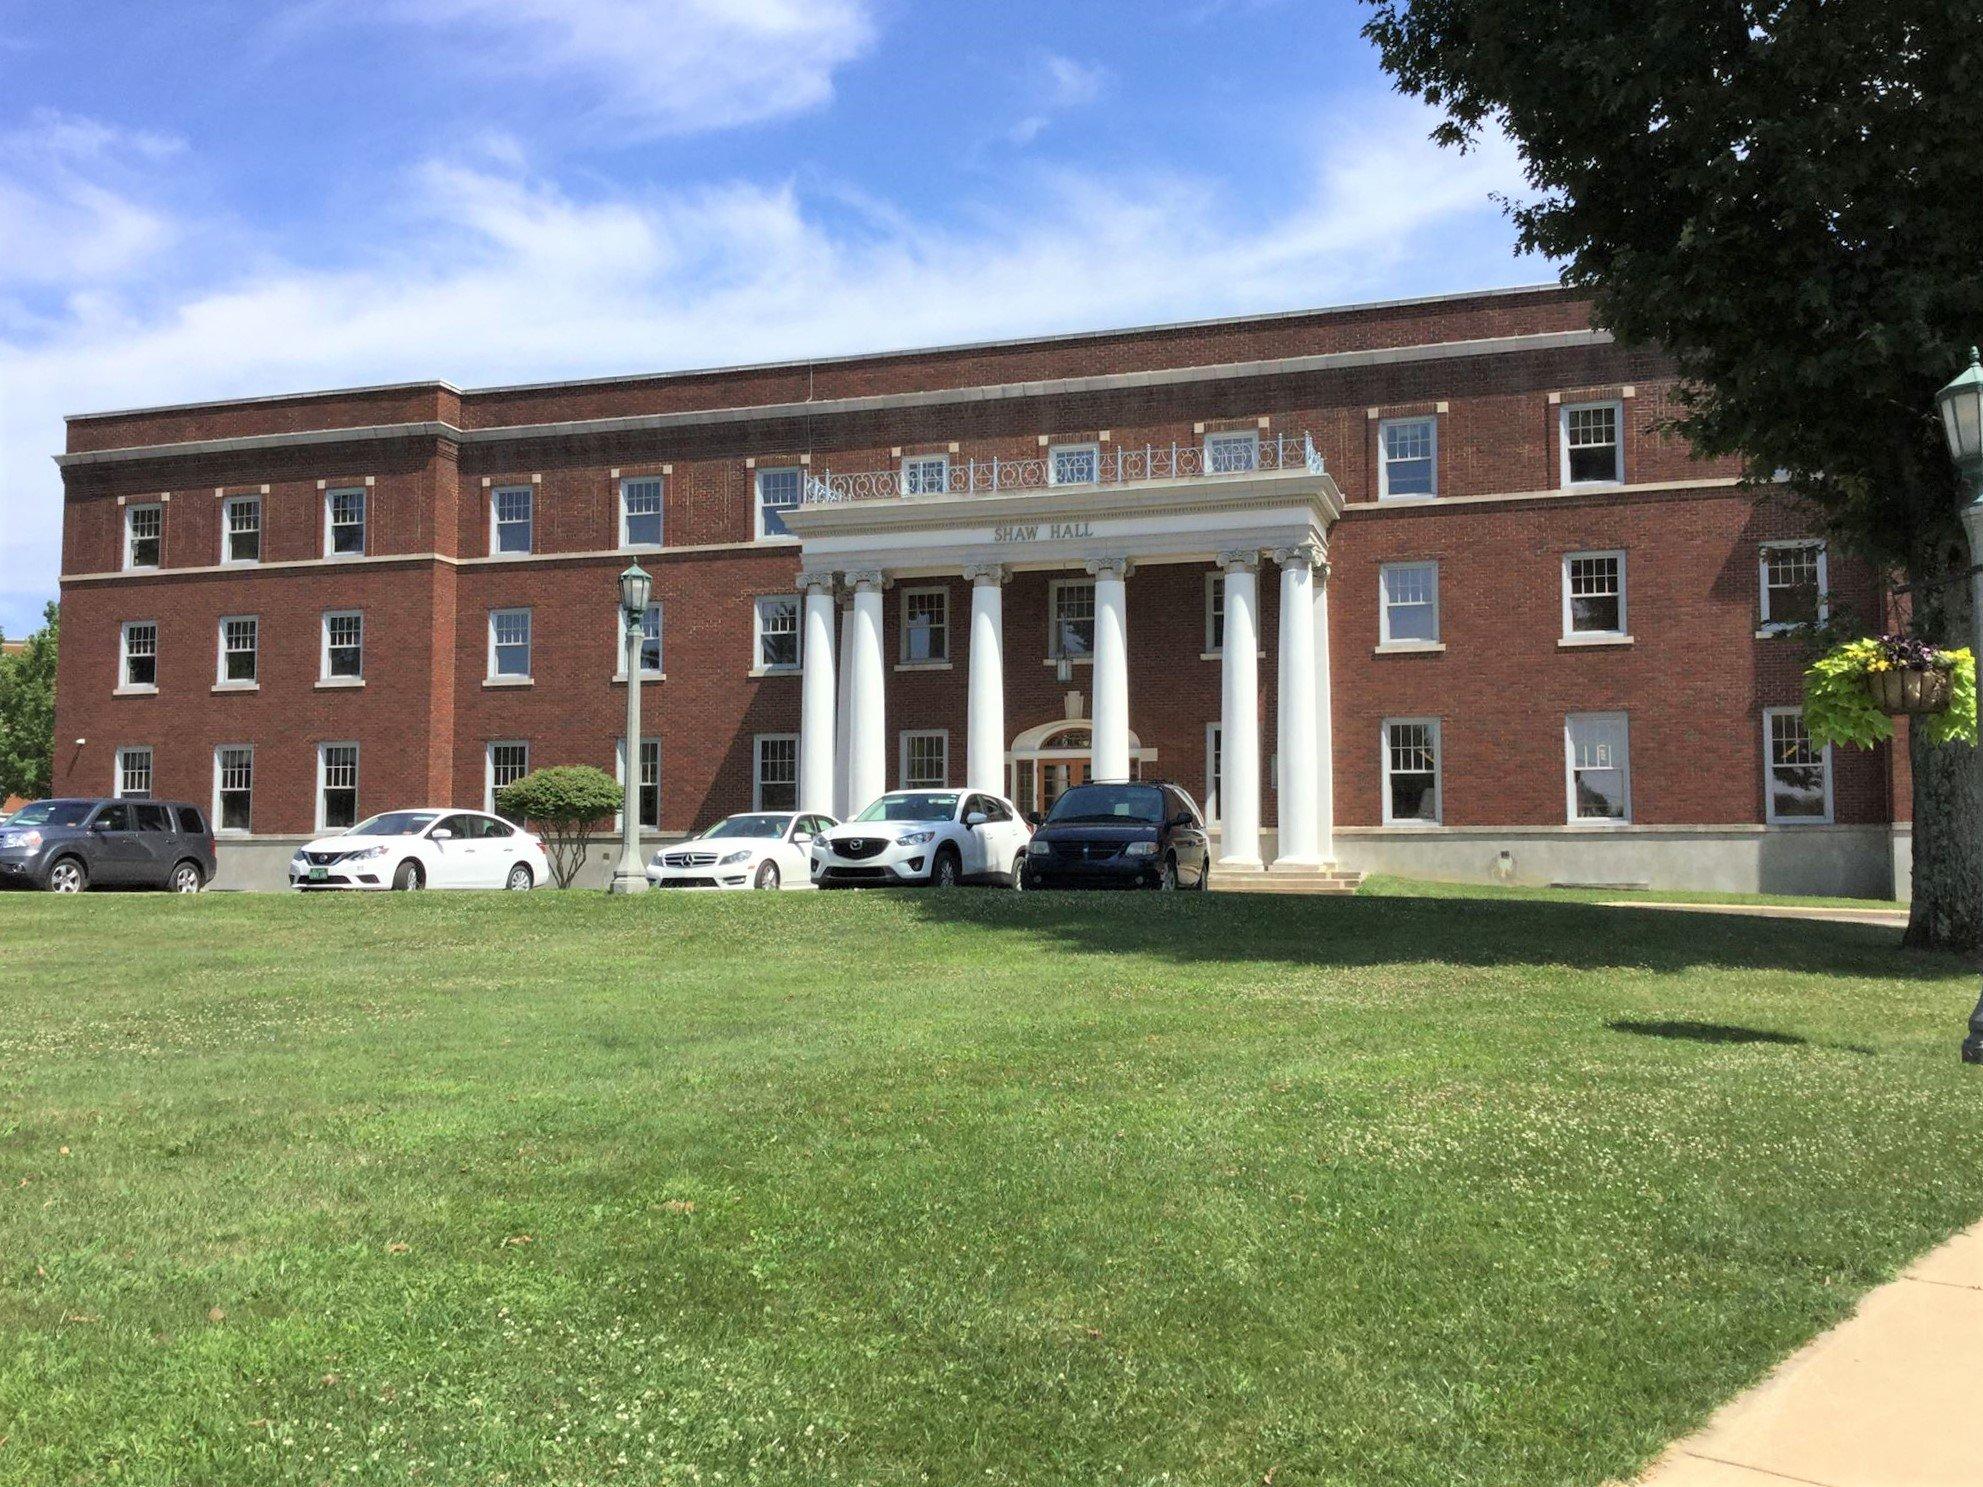 Shaw Hall (Photo courtesy of Susan Jones)